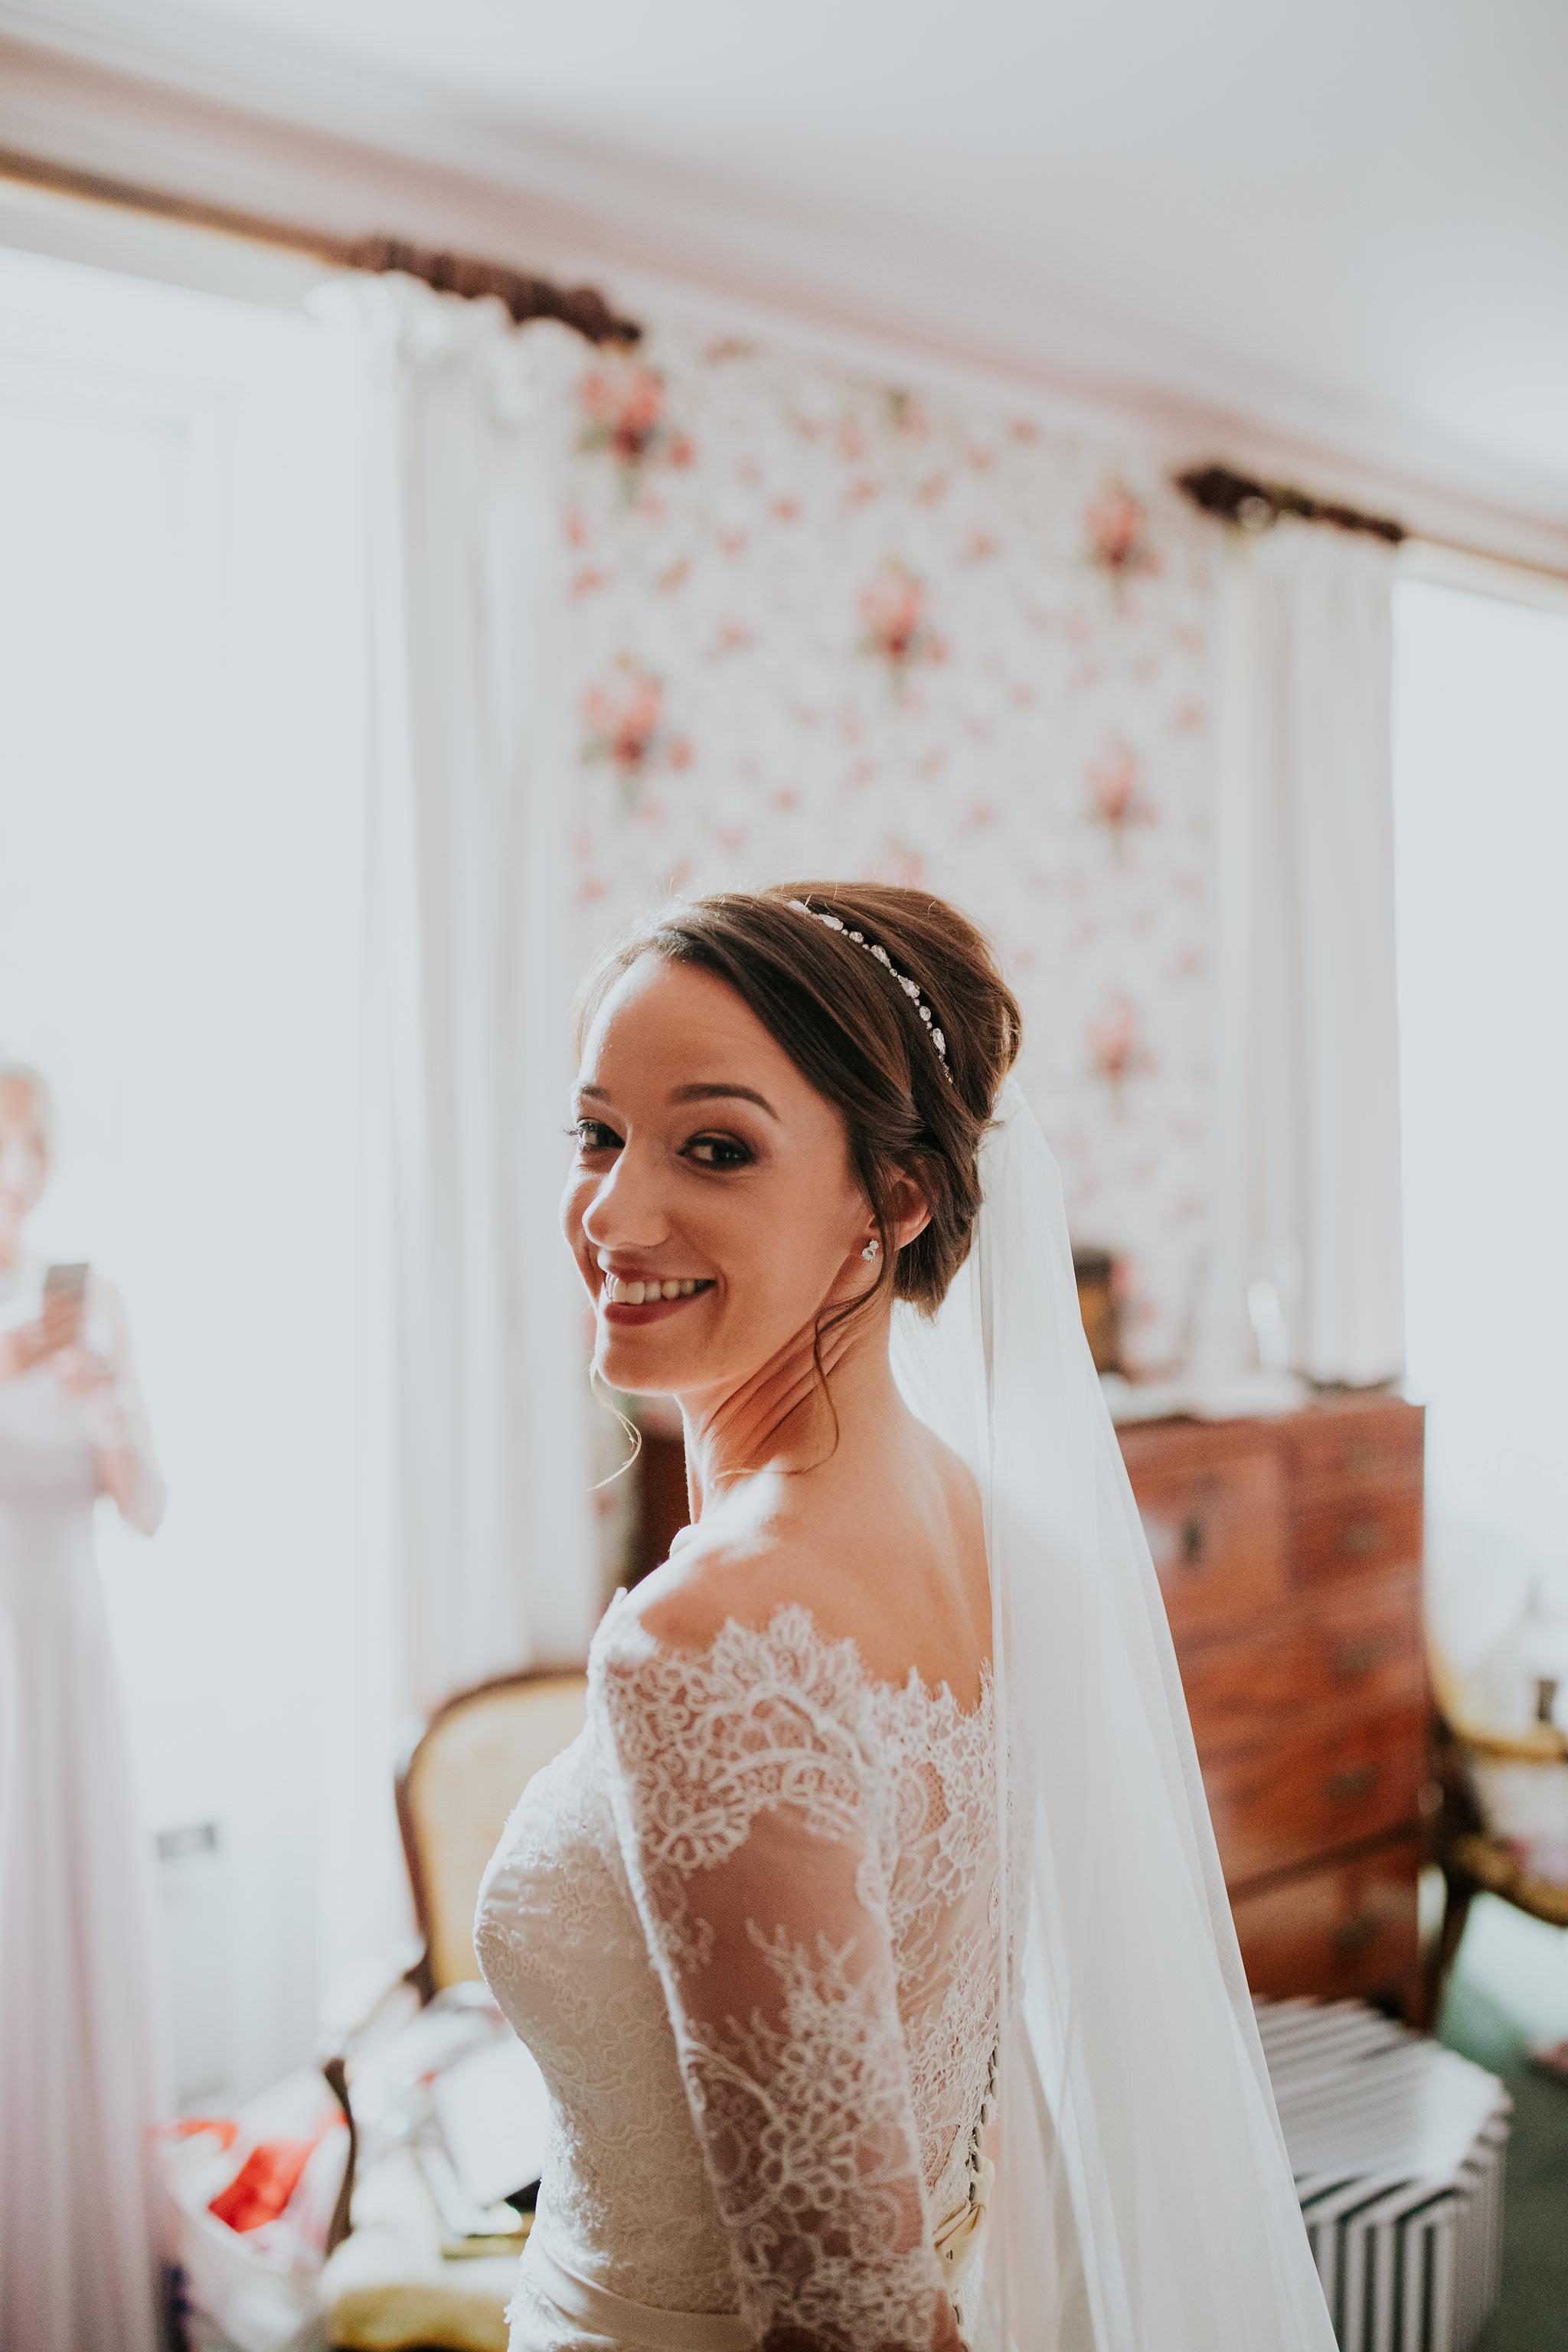 kirknewton stables wedding photographer (16).jpg